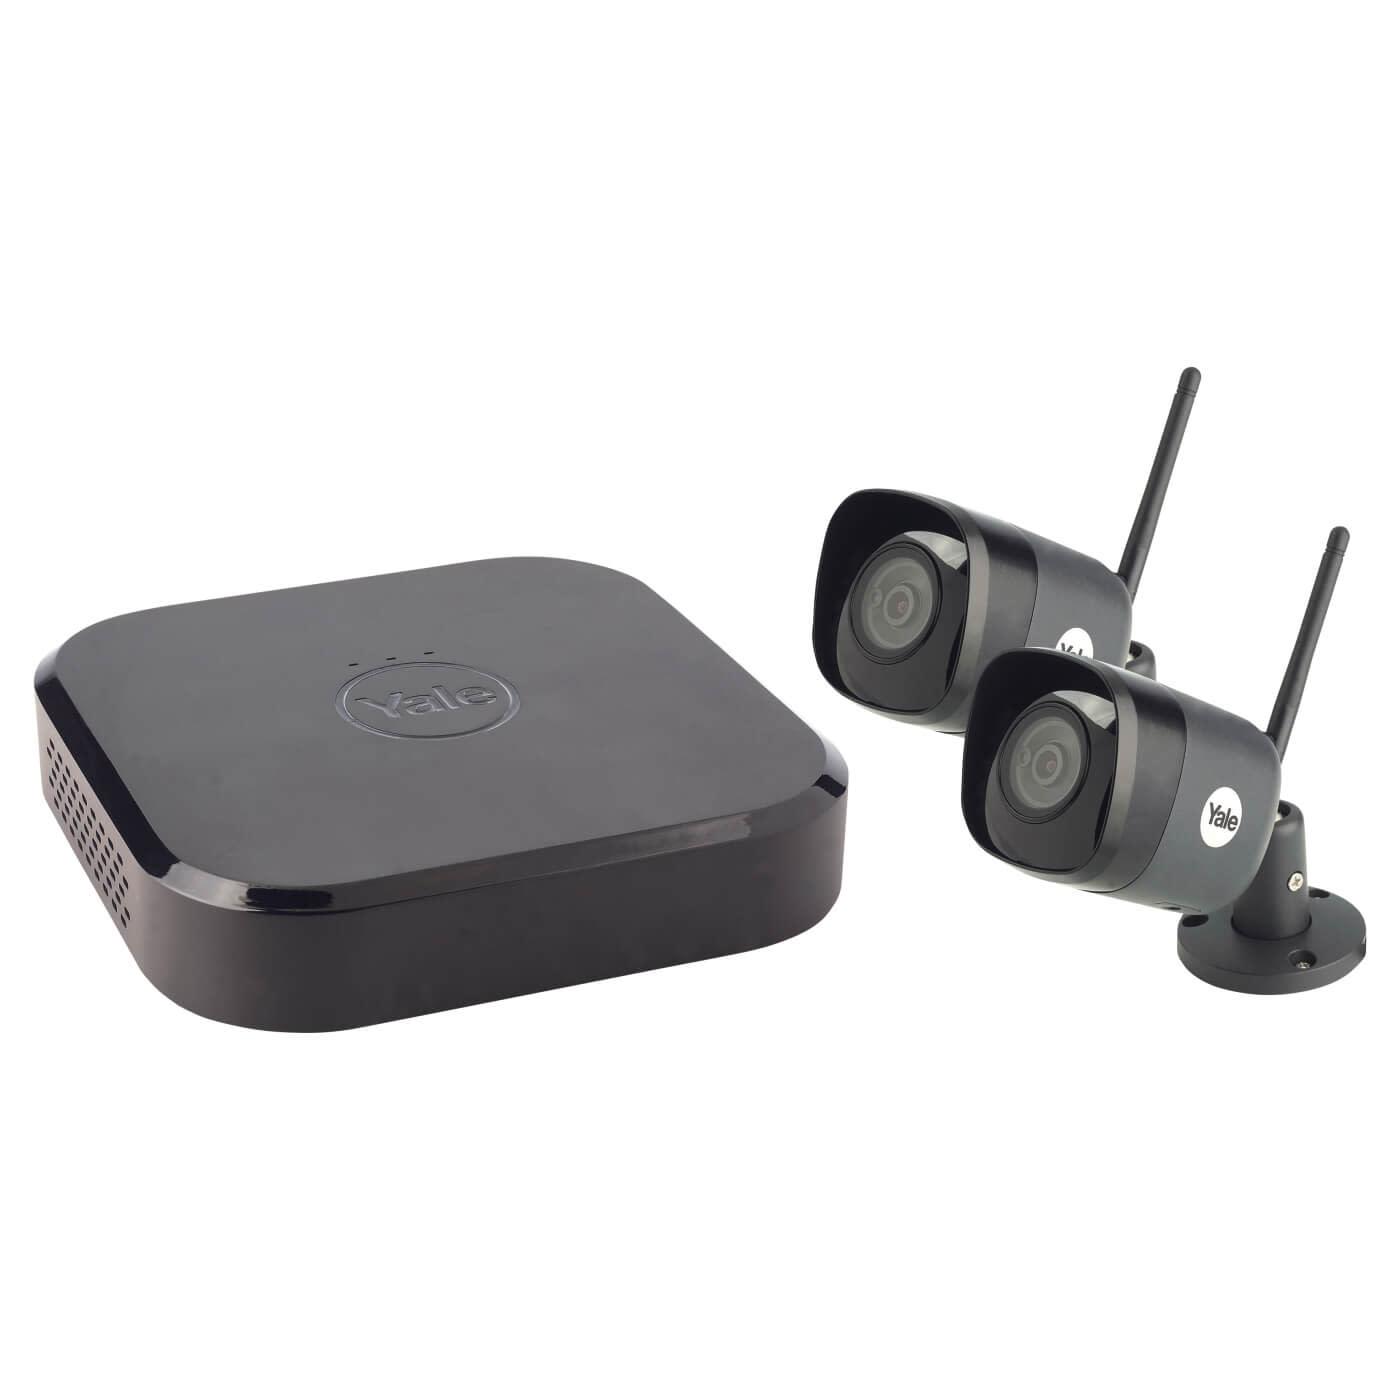 Yale Smart Home CCTV Wi-Fi Camera - 4MP - 2 Cameras)